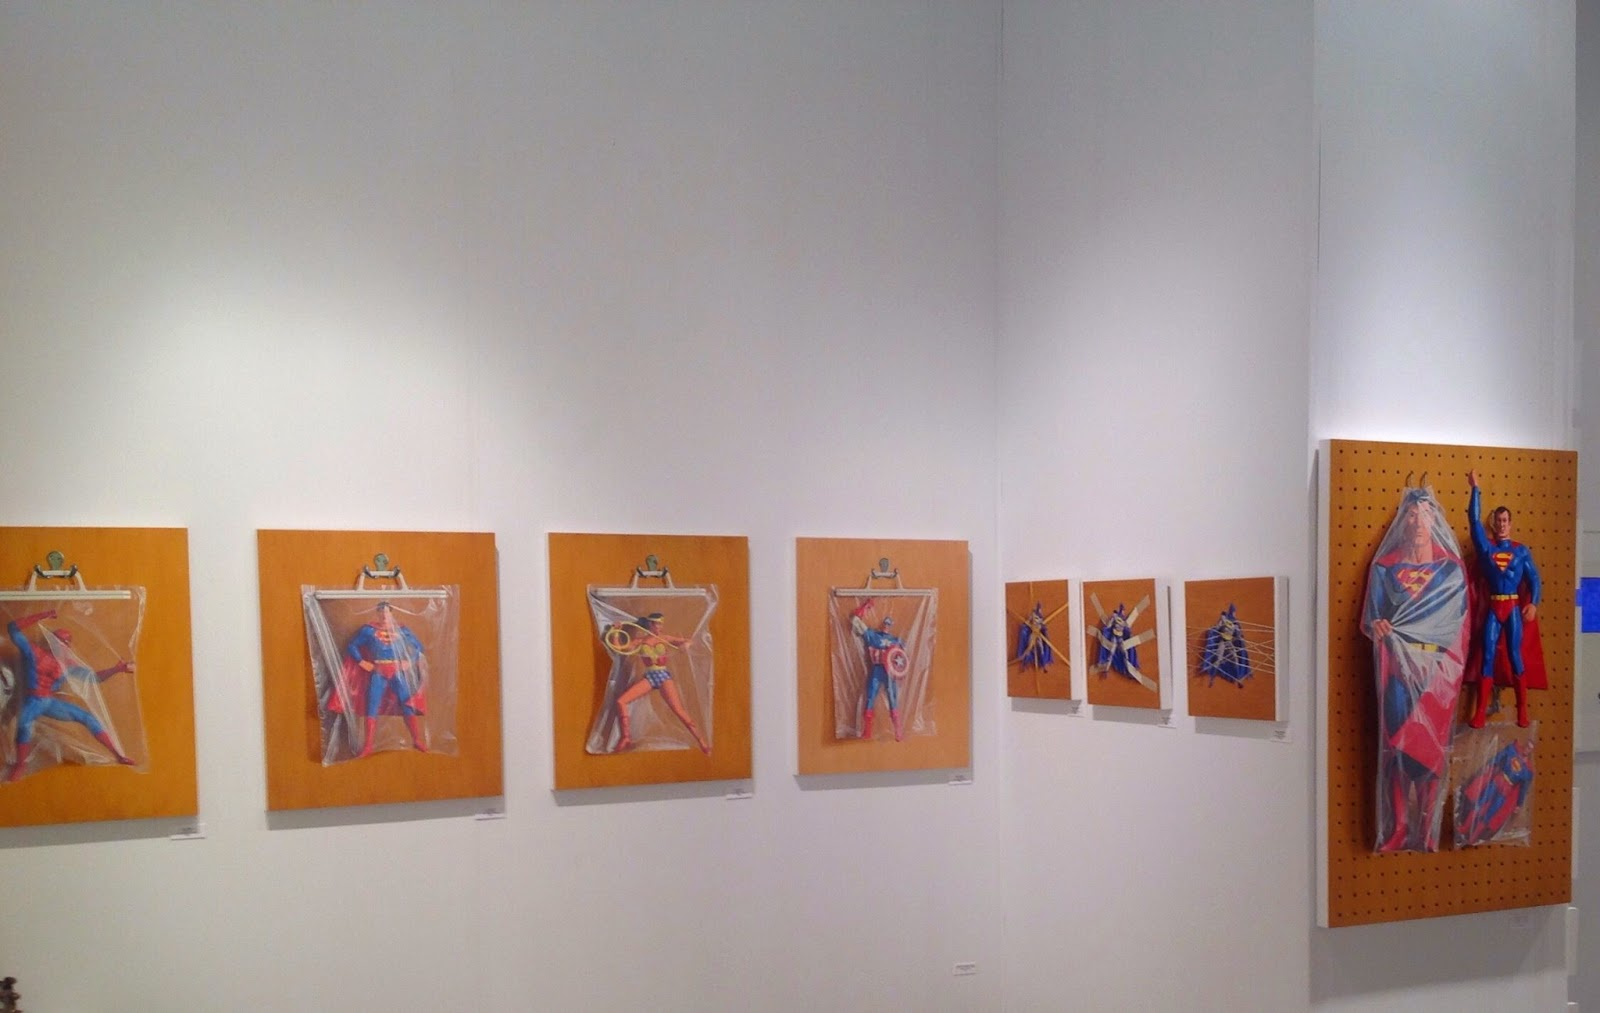 Simon Monk wall at Context Art Miami - Alida Anderson Art Projects